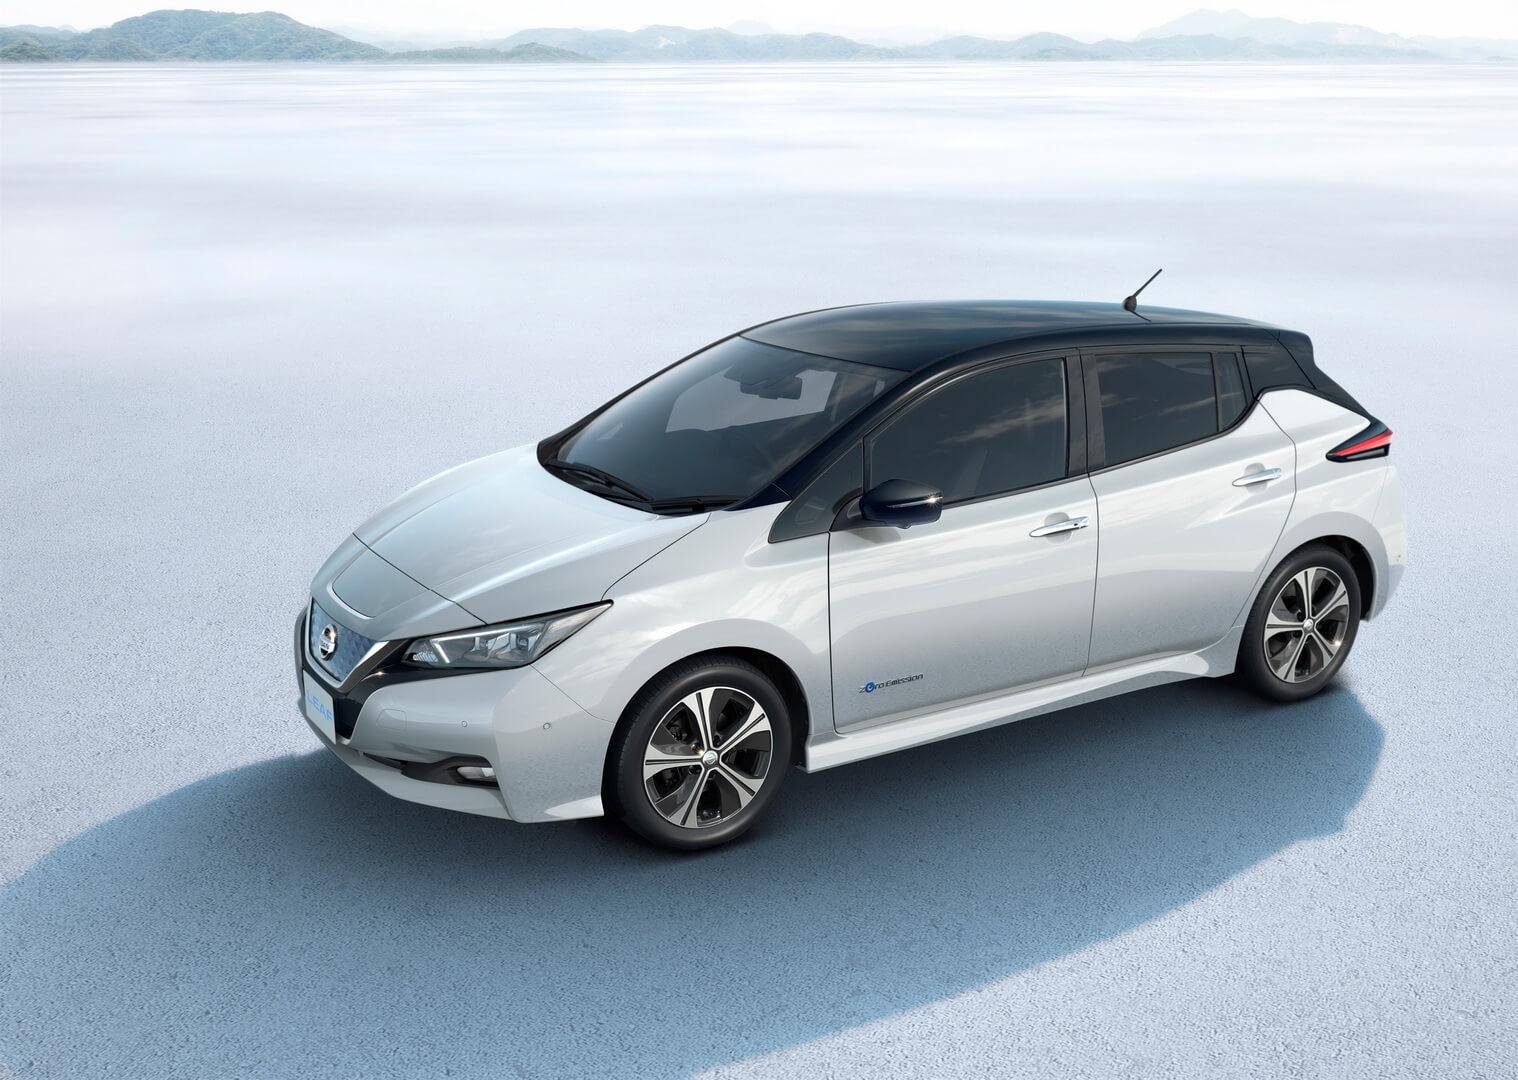 Фотография экоавто Nissan Leaf 2018 (60 кВт•ч) - фото 24